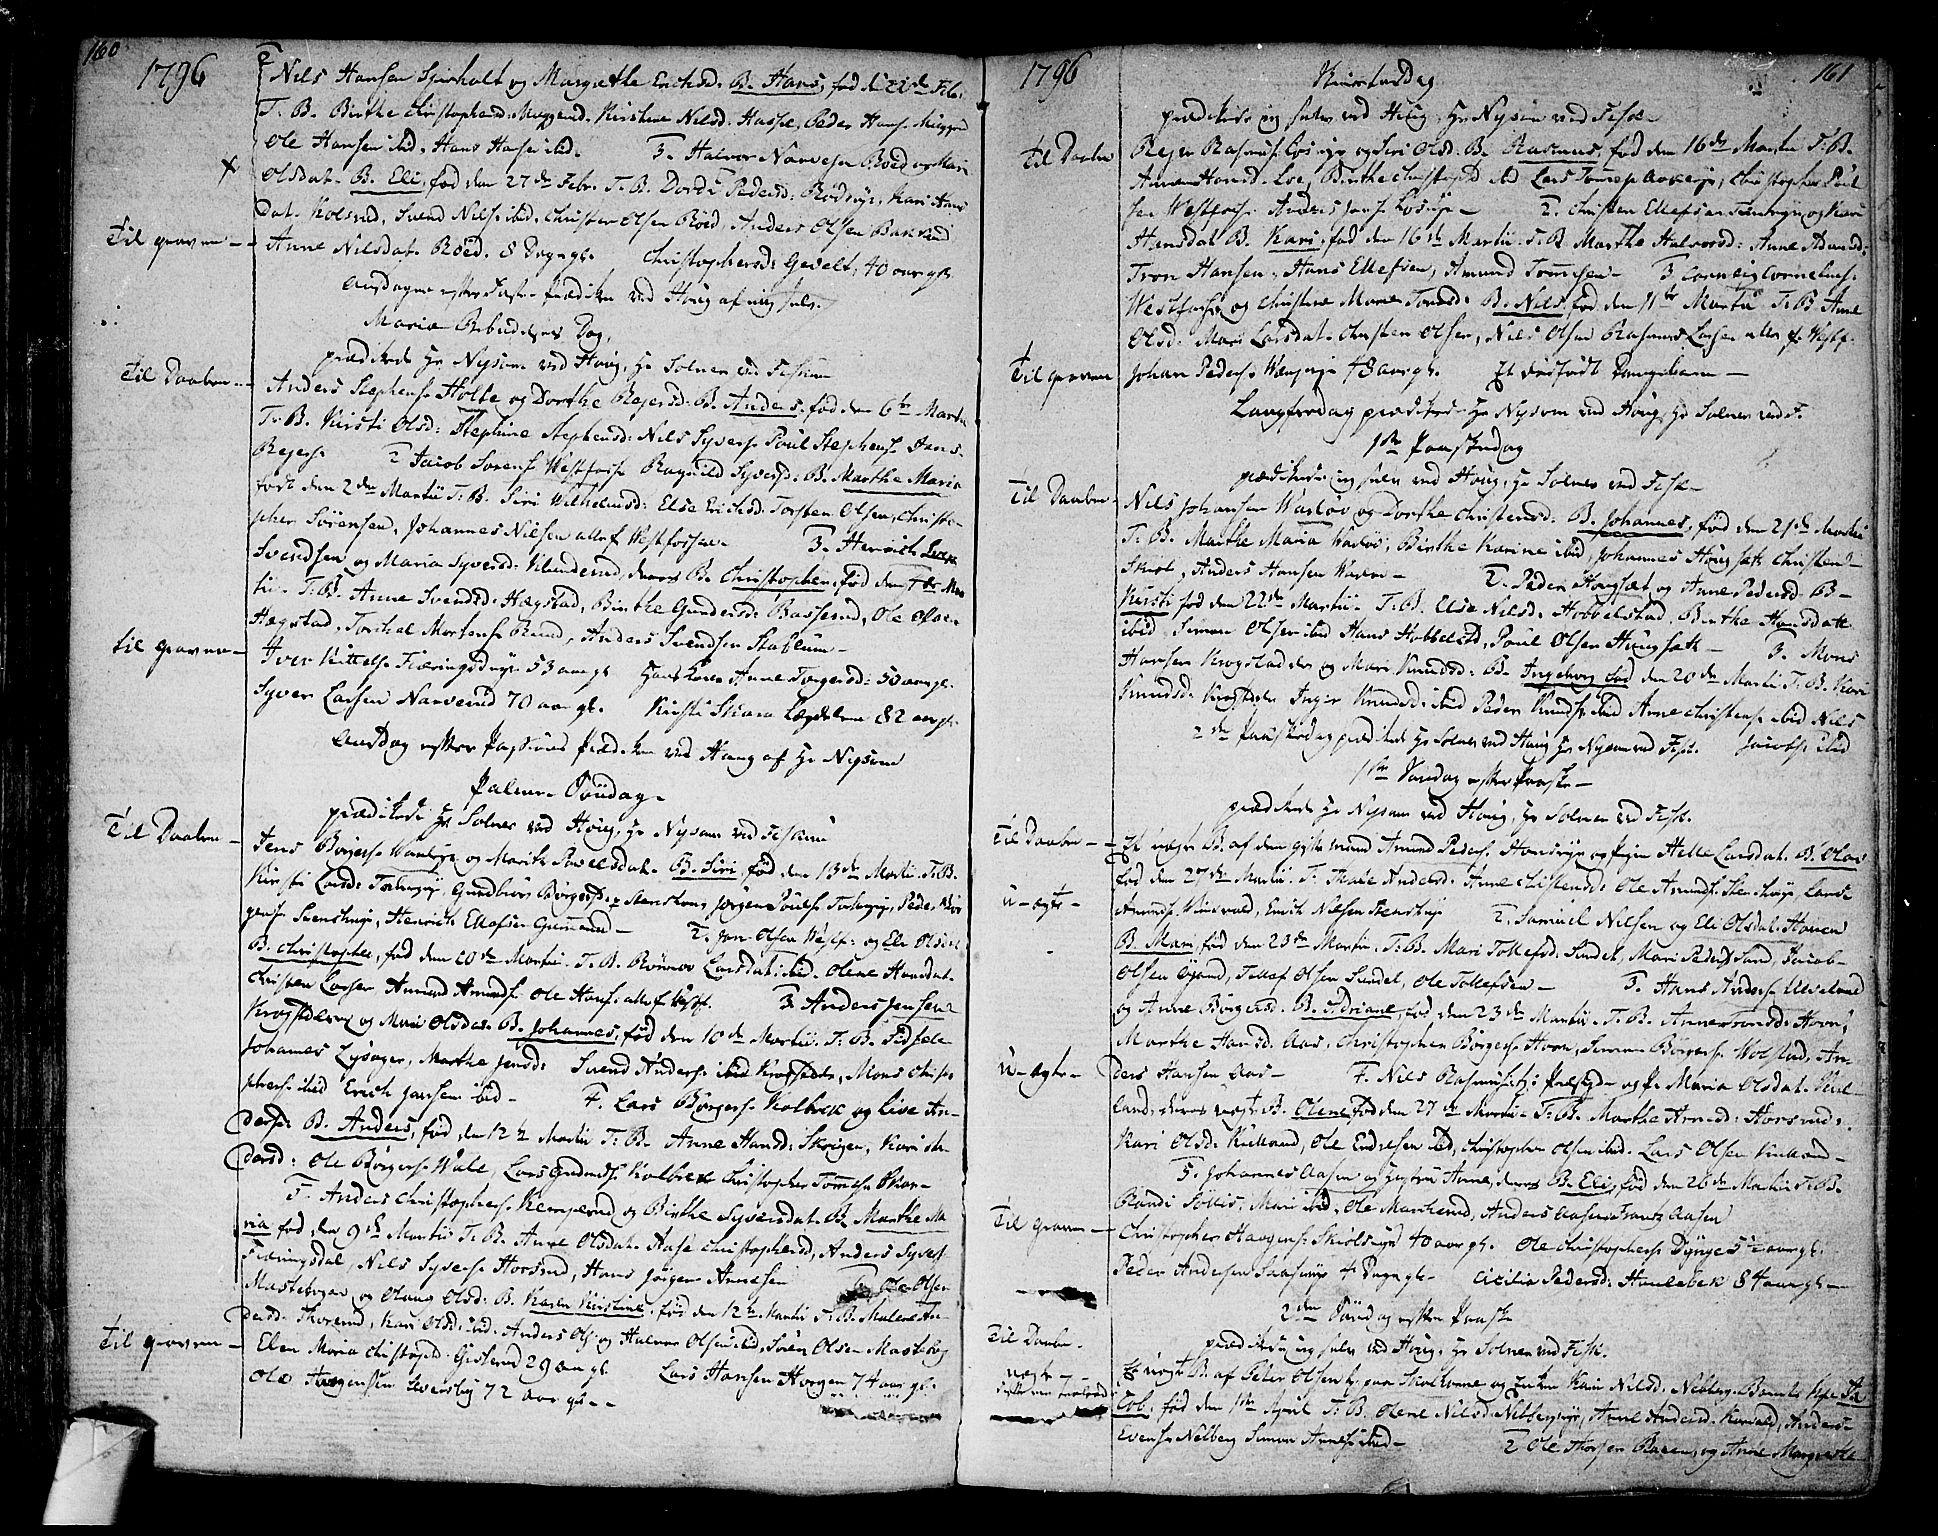 SAKO, Eiker kirkebøker, F/Fa/L0009: Ministerialbok nr. I 9, 1789-1806, s. 160-161